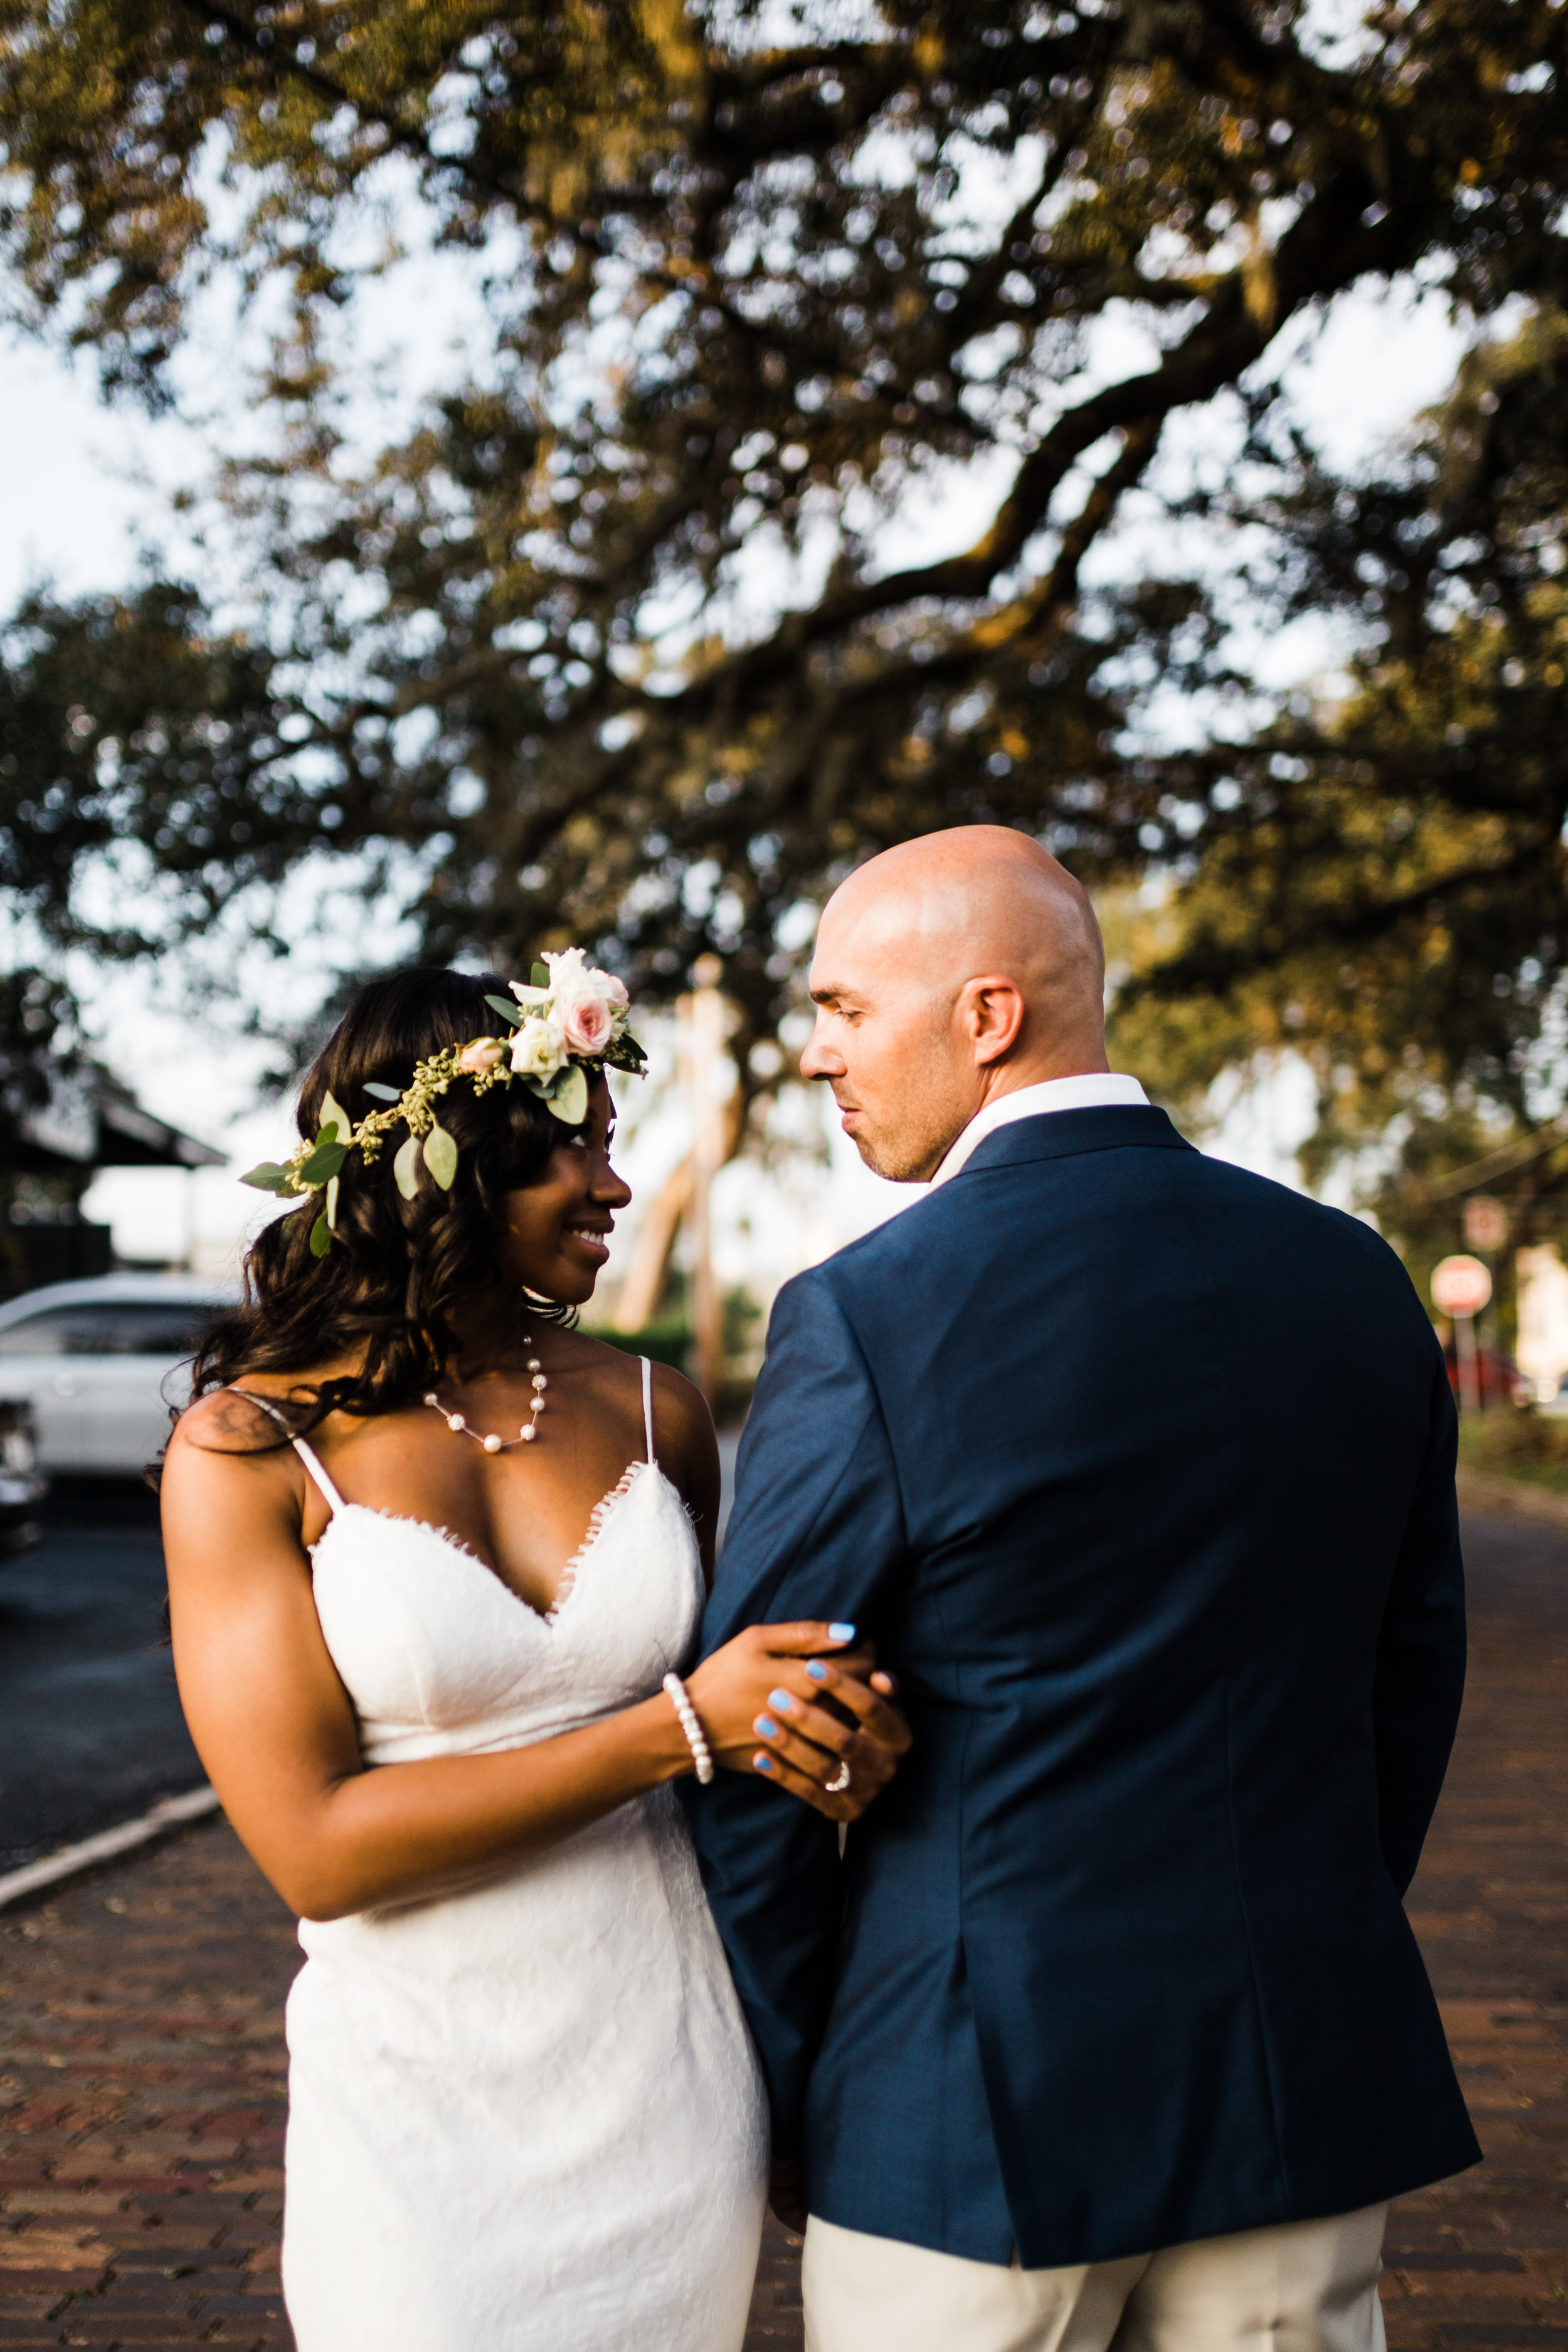 2017.09.16 Ashley and Chuck O'Day Quantam Leap Winery Wedding (435 of 462).jpg